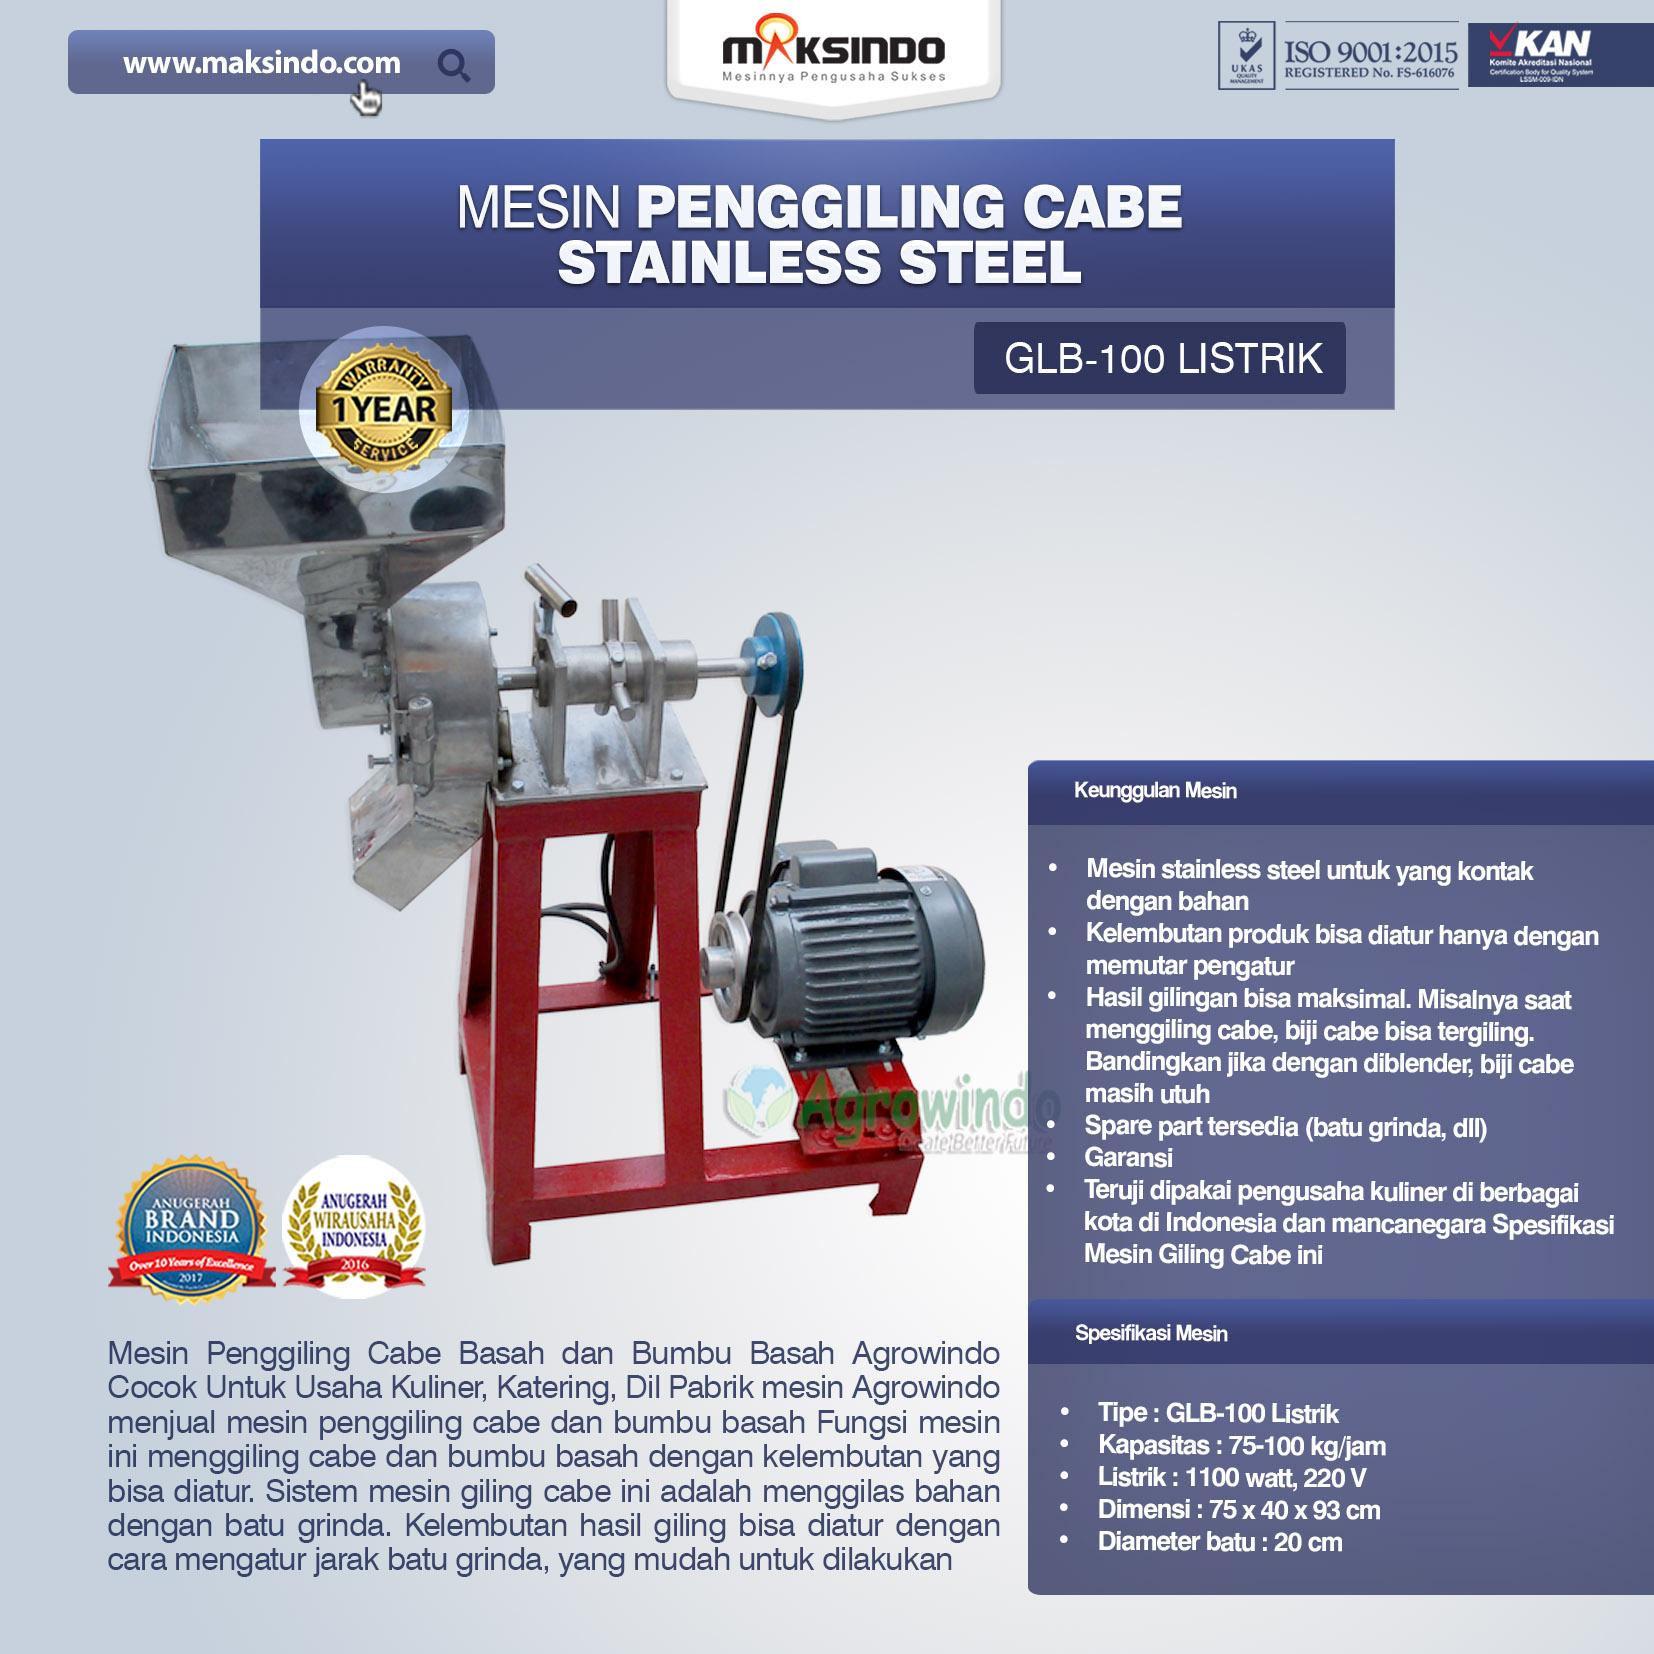 Mesin Penggiling Cabe Stainless Steel GLB-100 Listrik